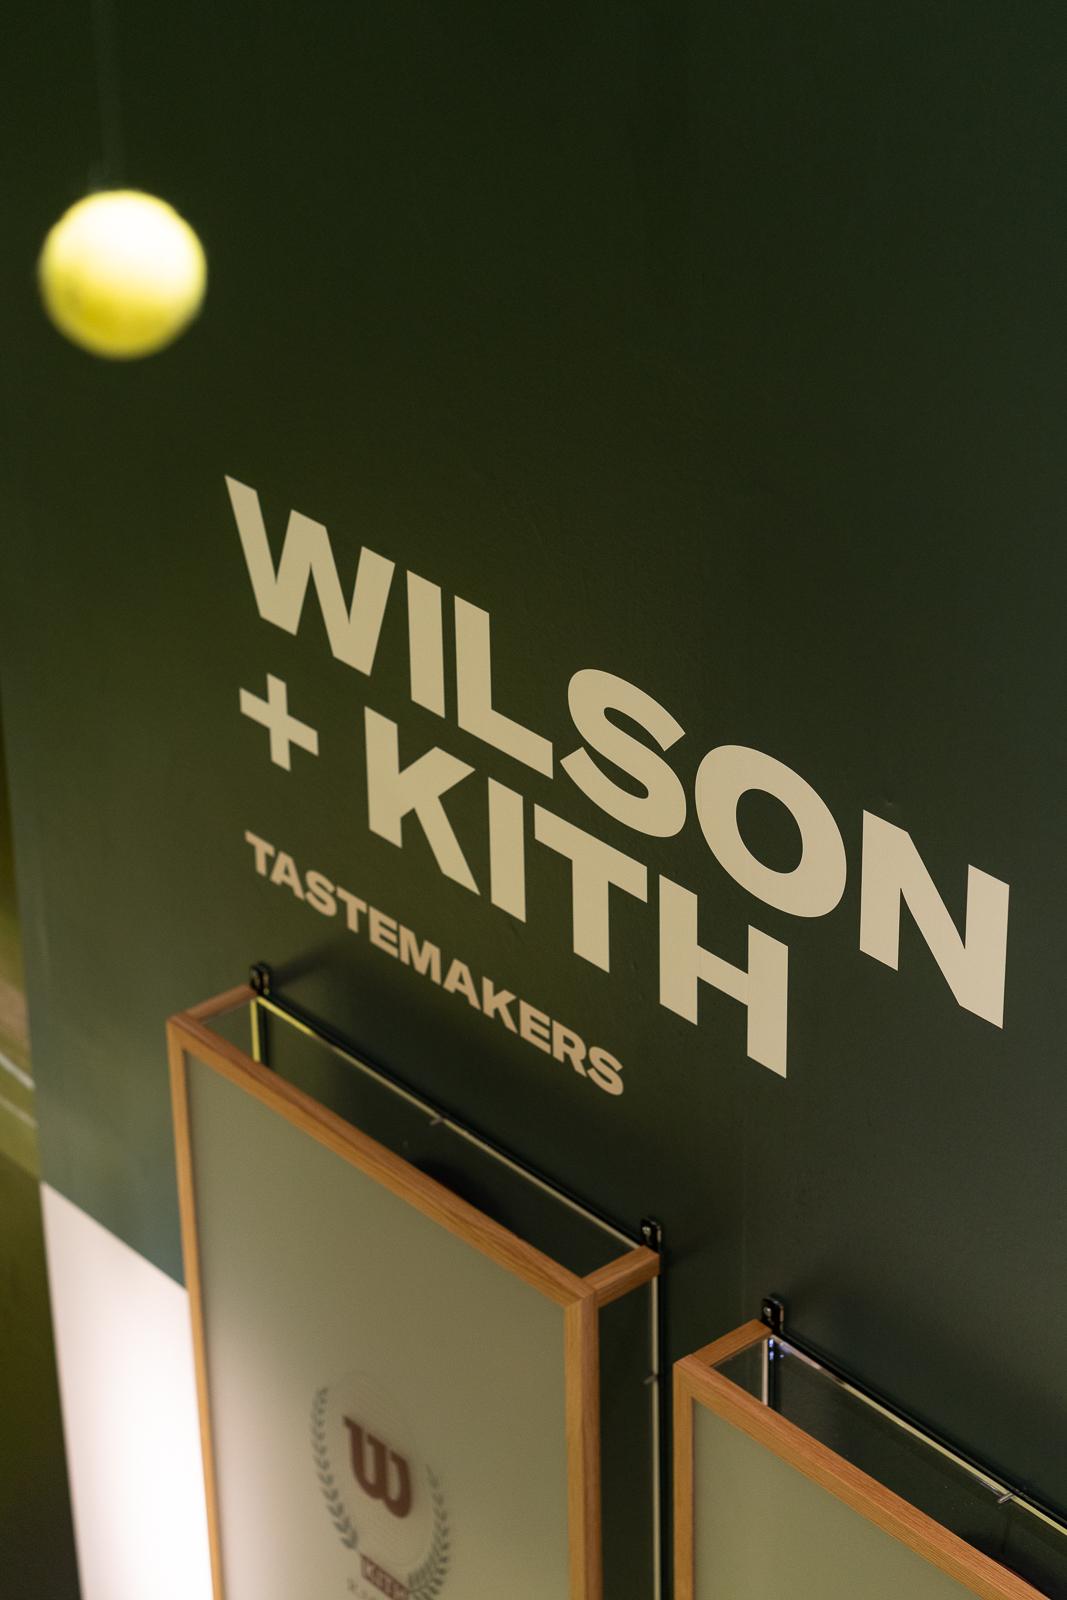 kith and wilson exhibit